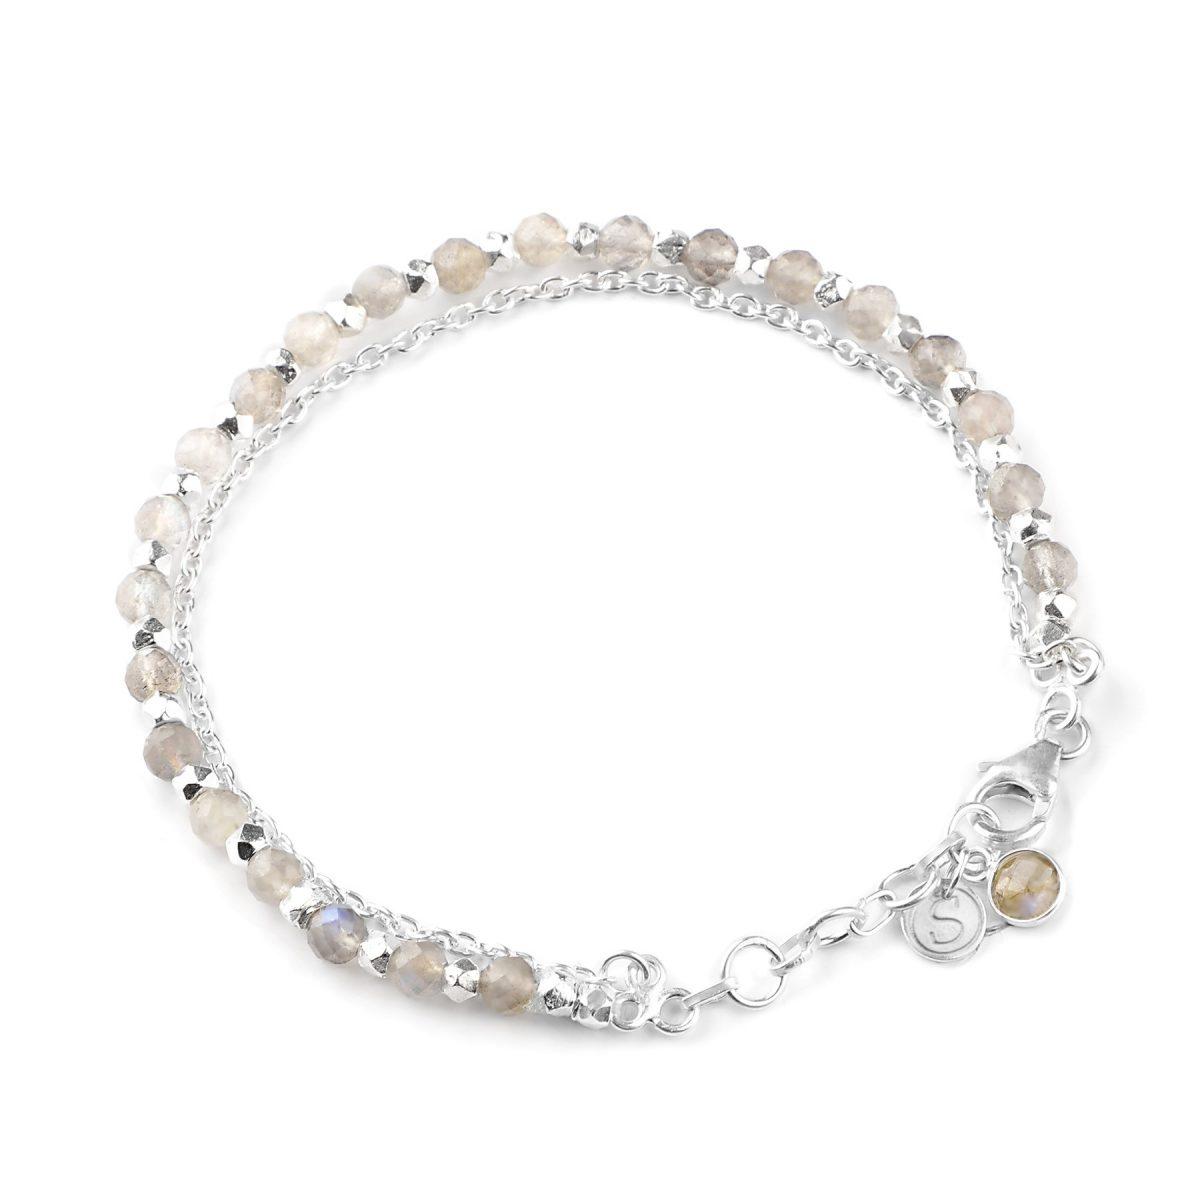 Labradorite beaded friendship bracelet in silver.